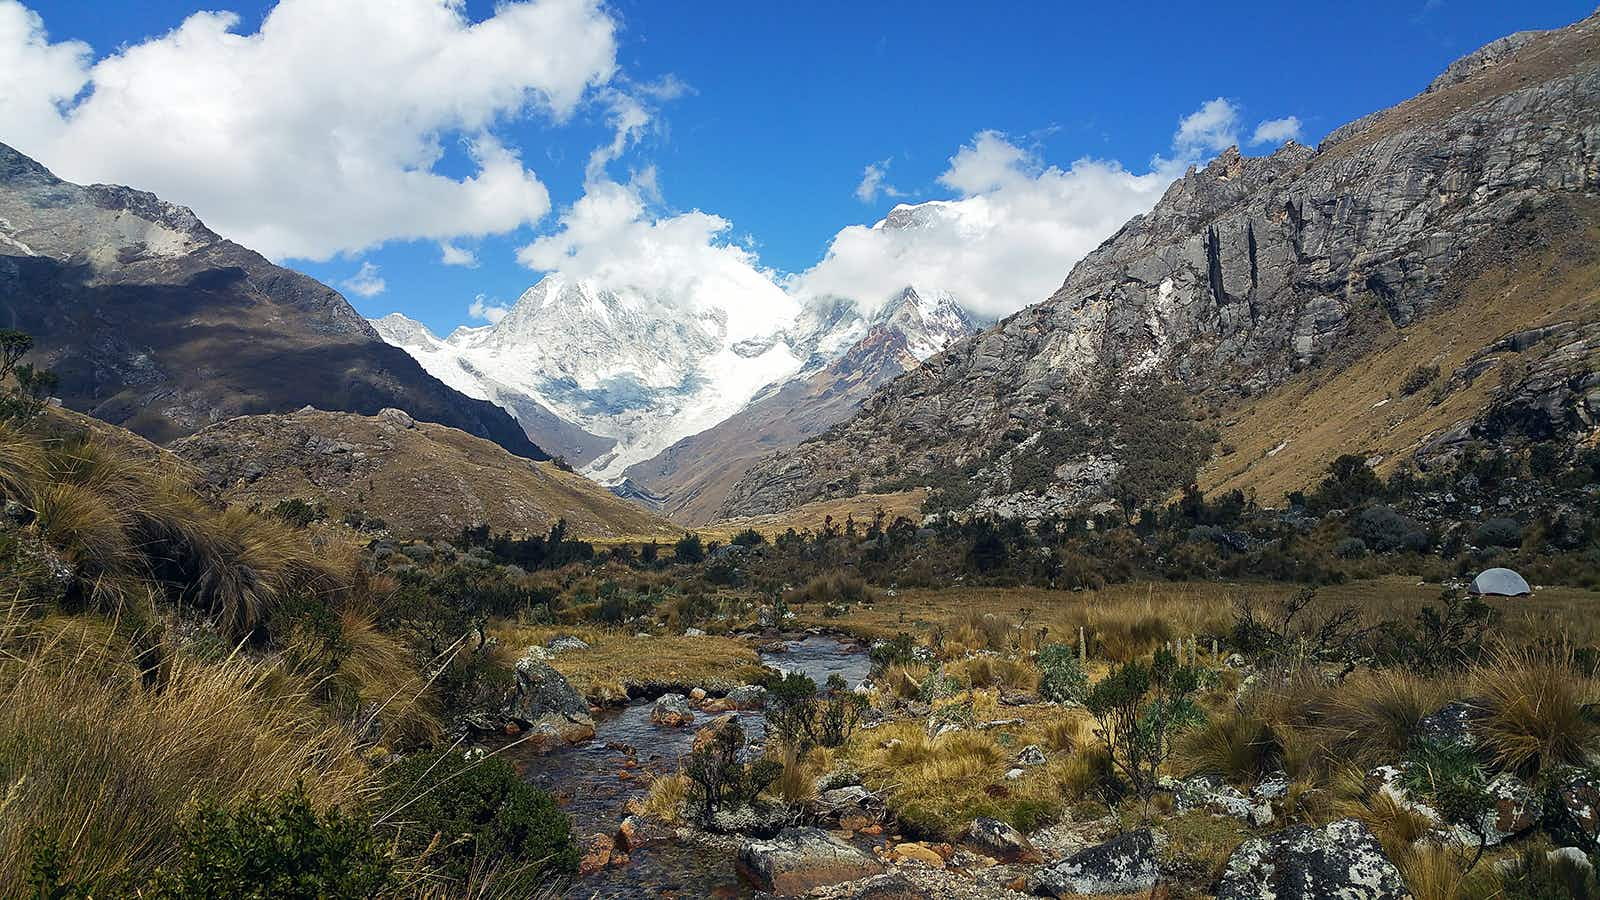 Day trips of Peru's Cordillera Blanca